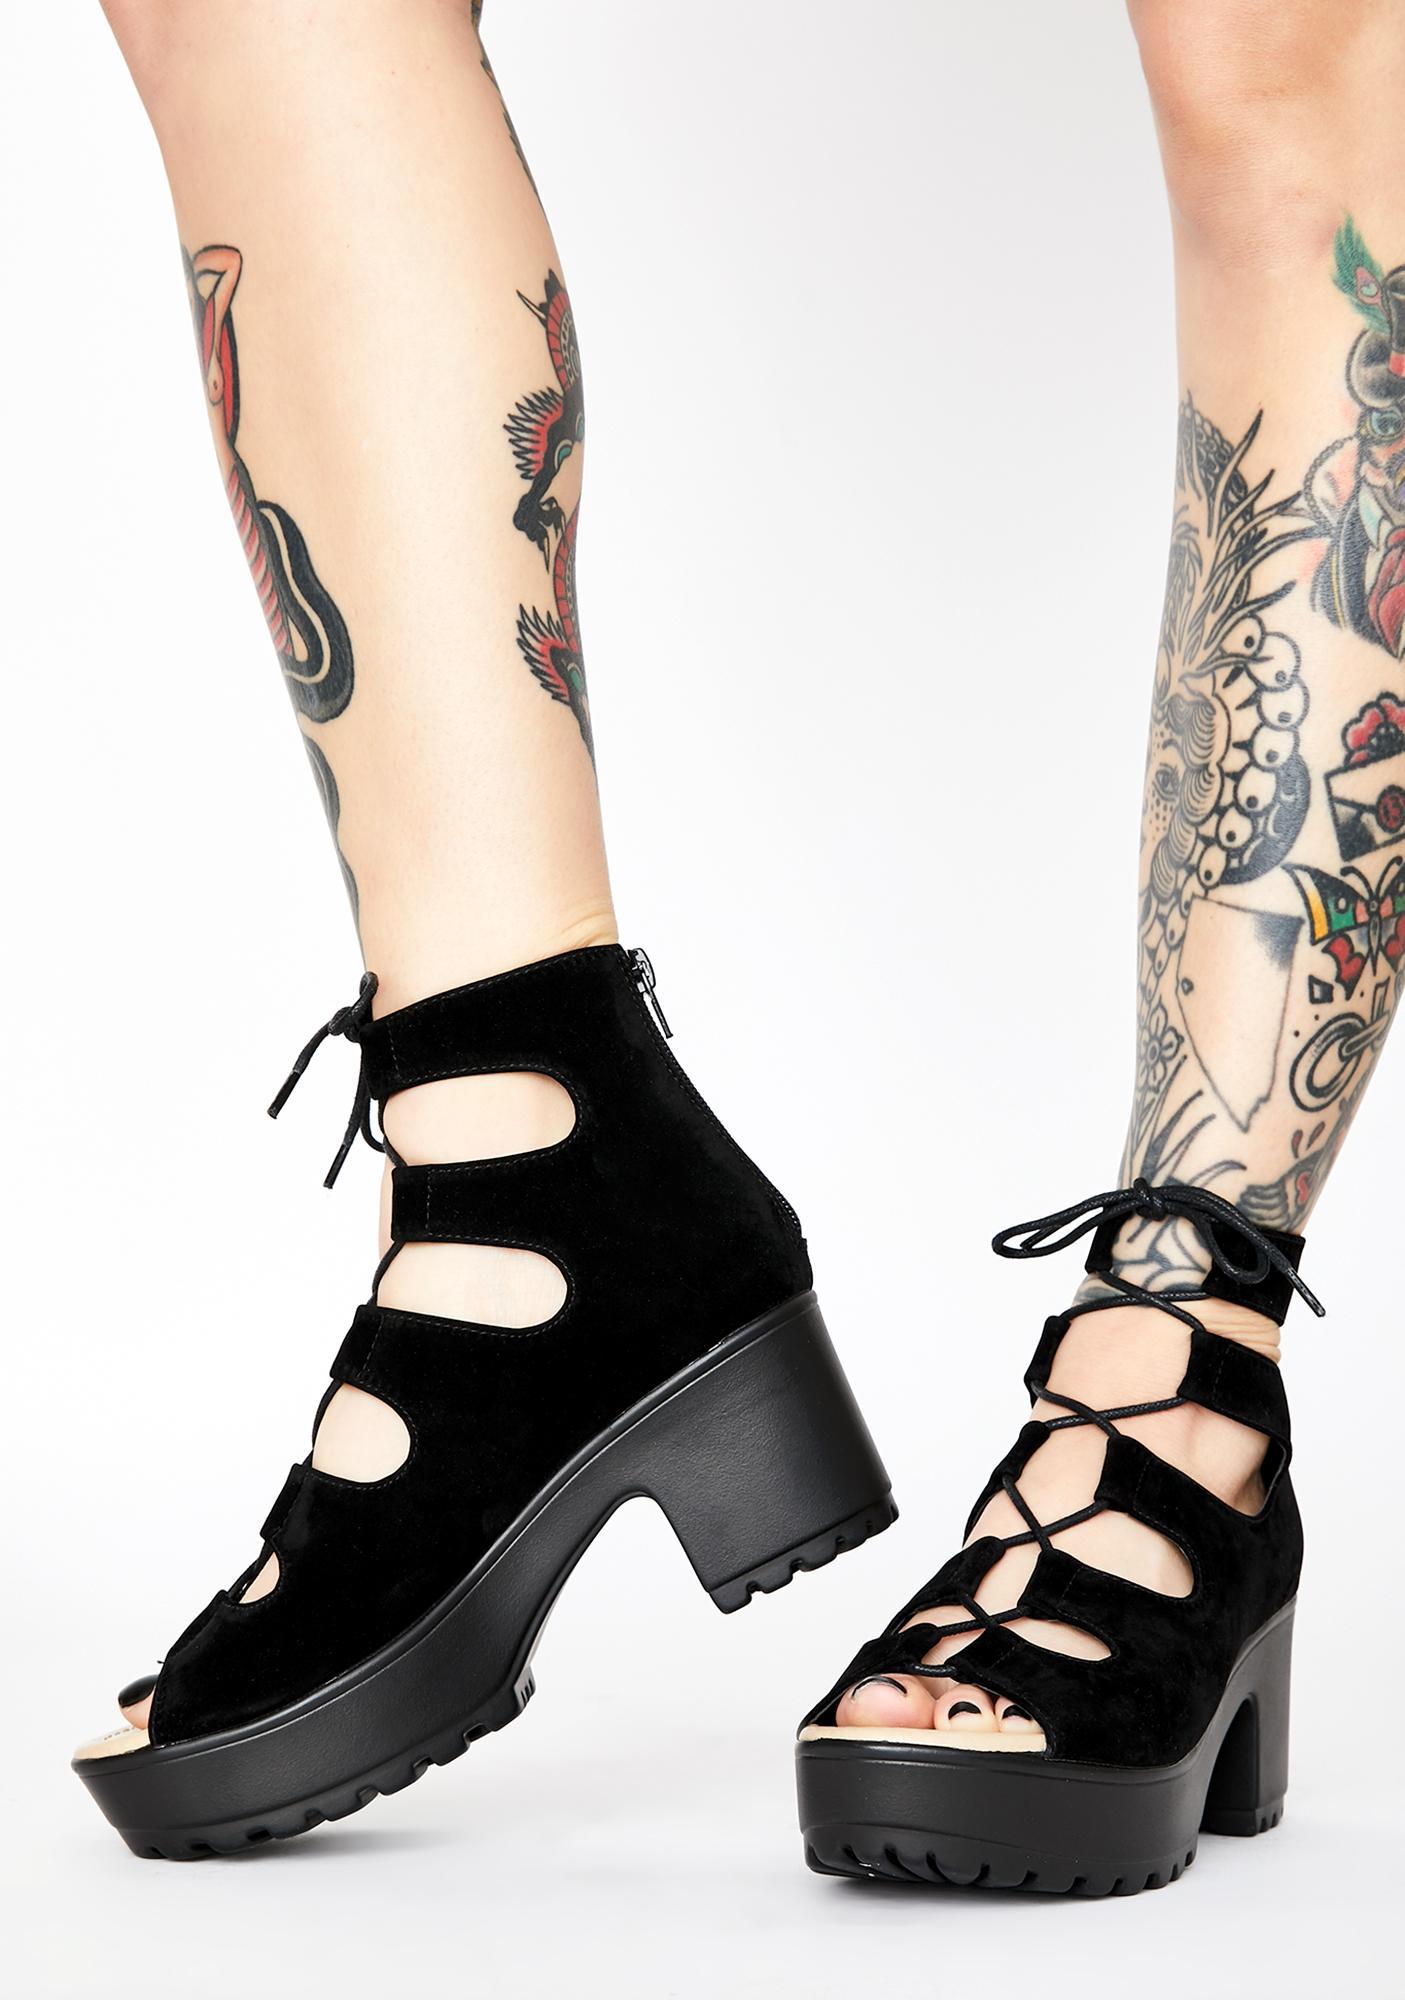 Koi Footwear Delo Lace Up Sandals